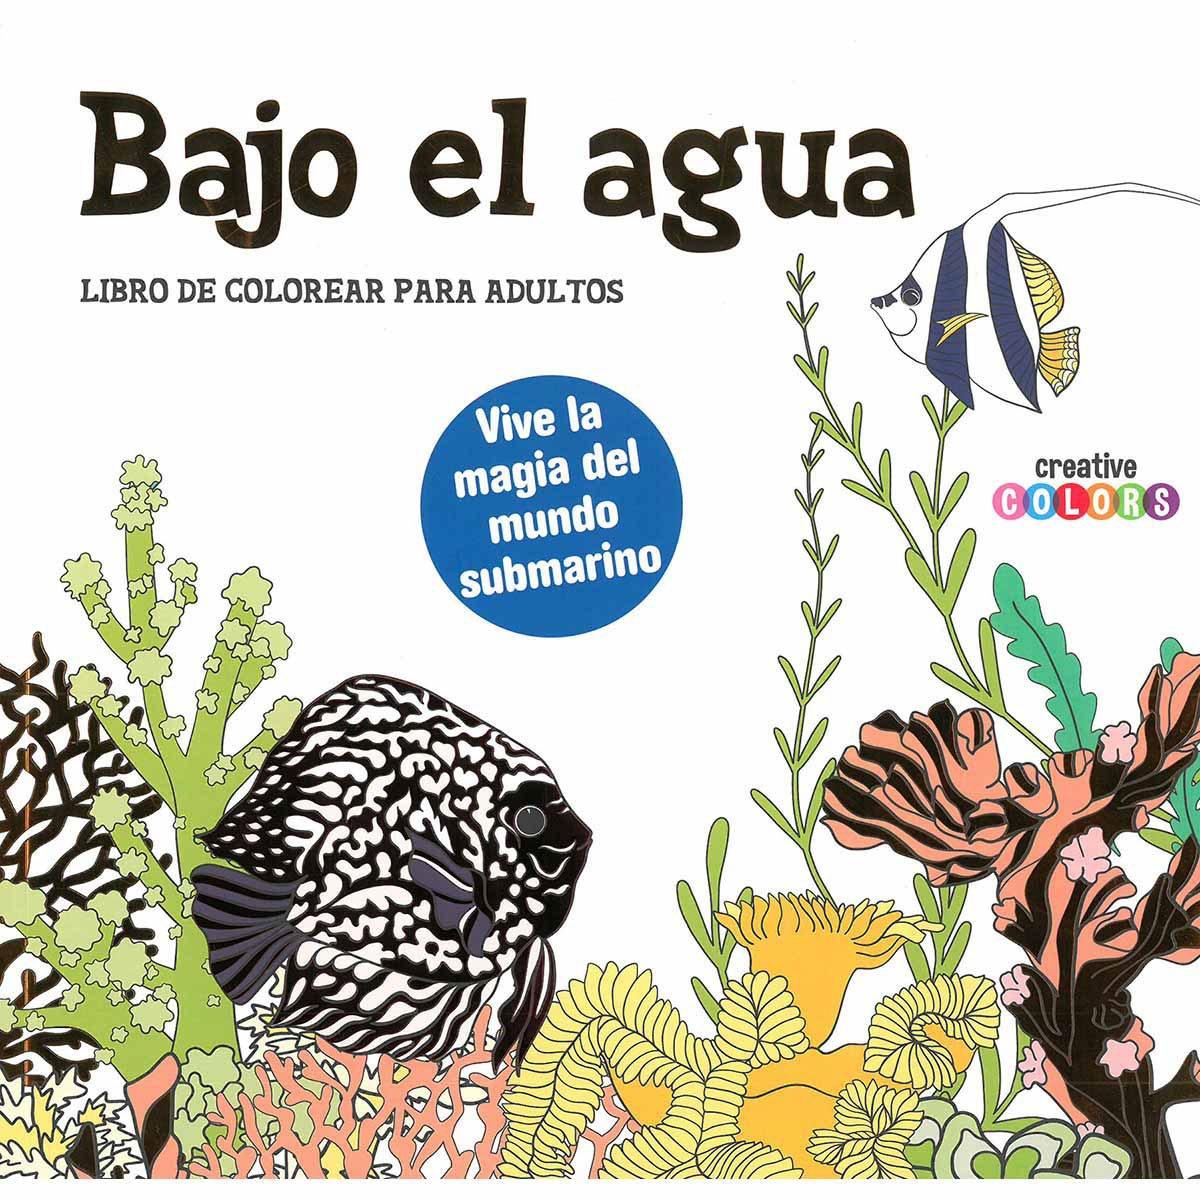 BAJO EL AGUA (LIBRO COLOREAR ADULTOS) DEVECCHI | SEARS.COM.MX - Me ...